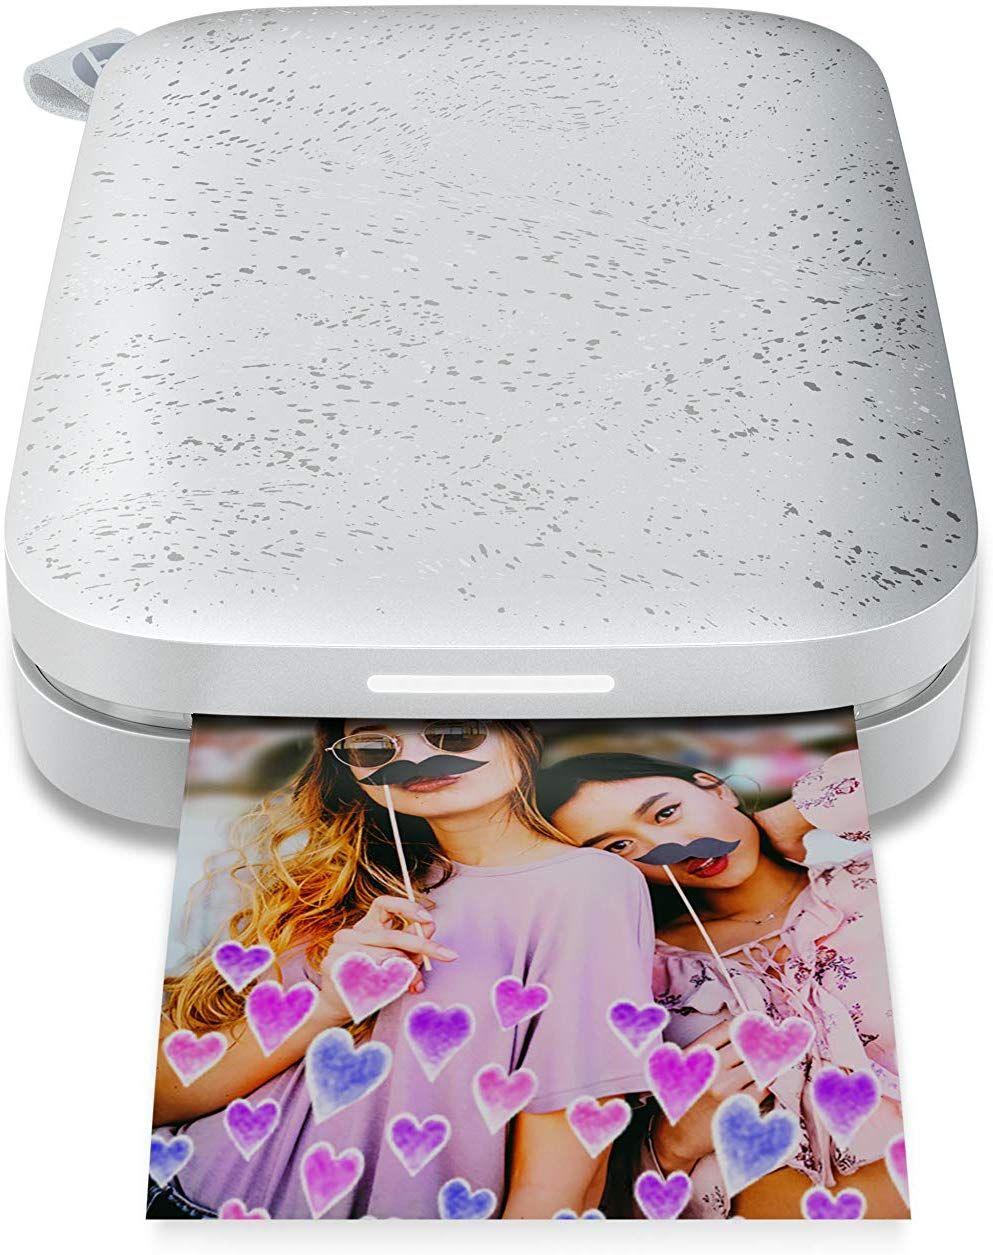 HP Sprocket 200 Portable Smartphone Photo Printer White £69.99 @ Amazon